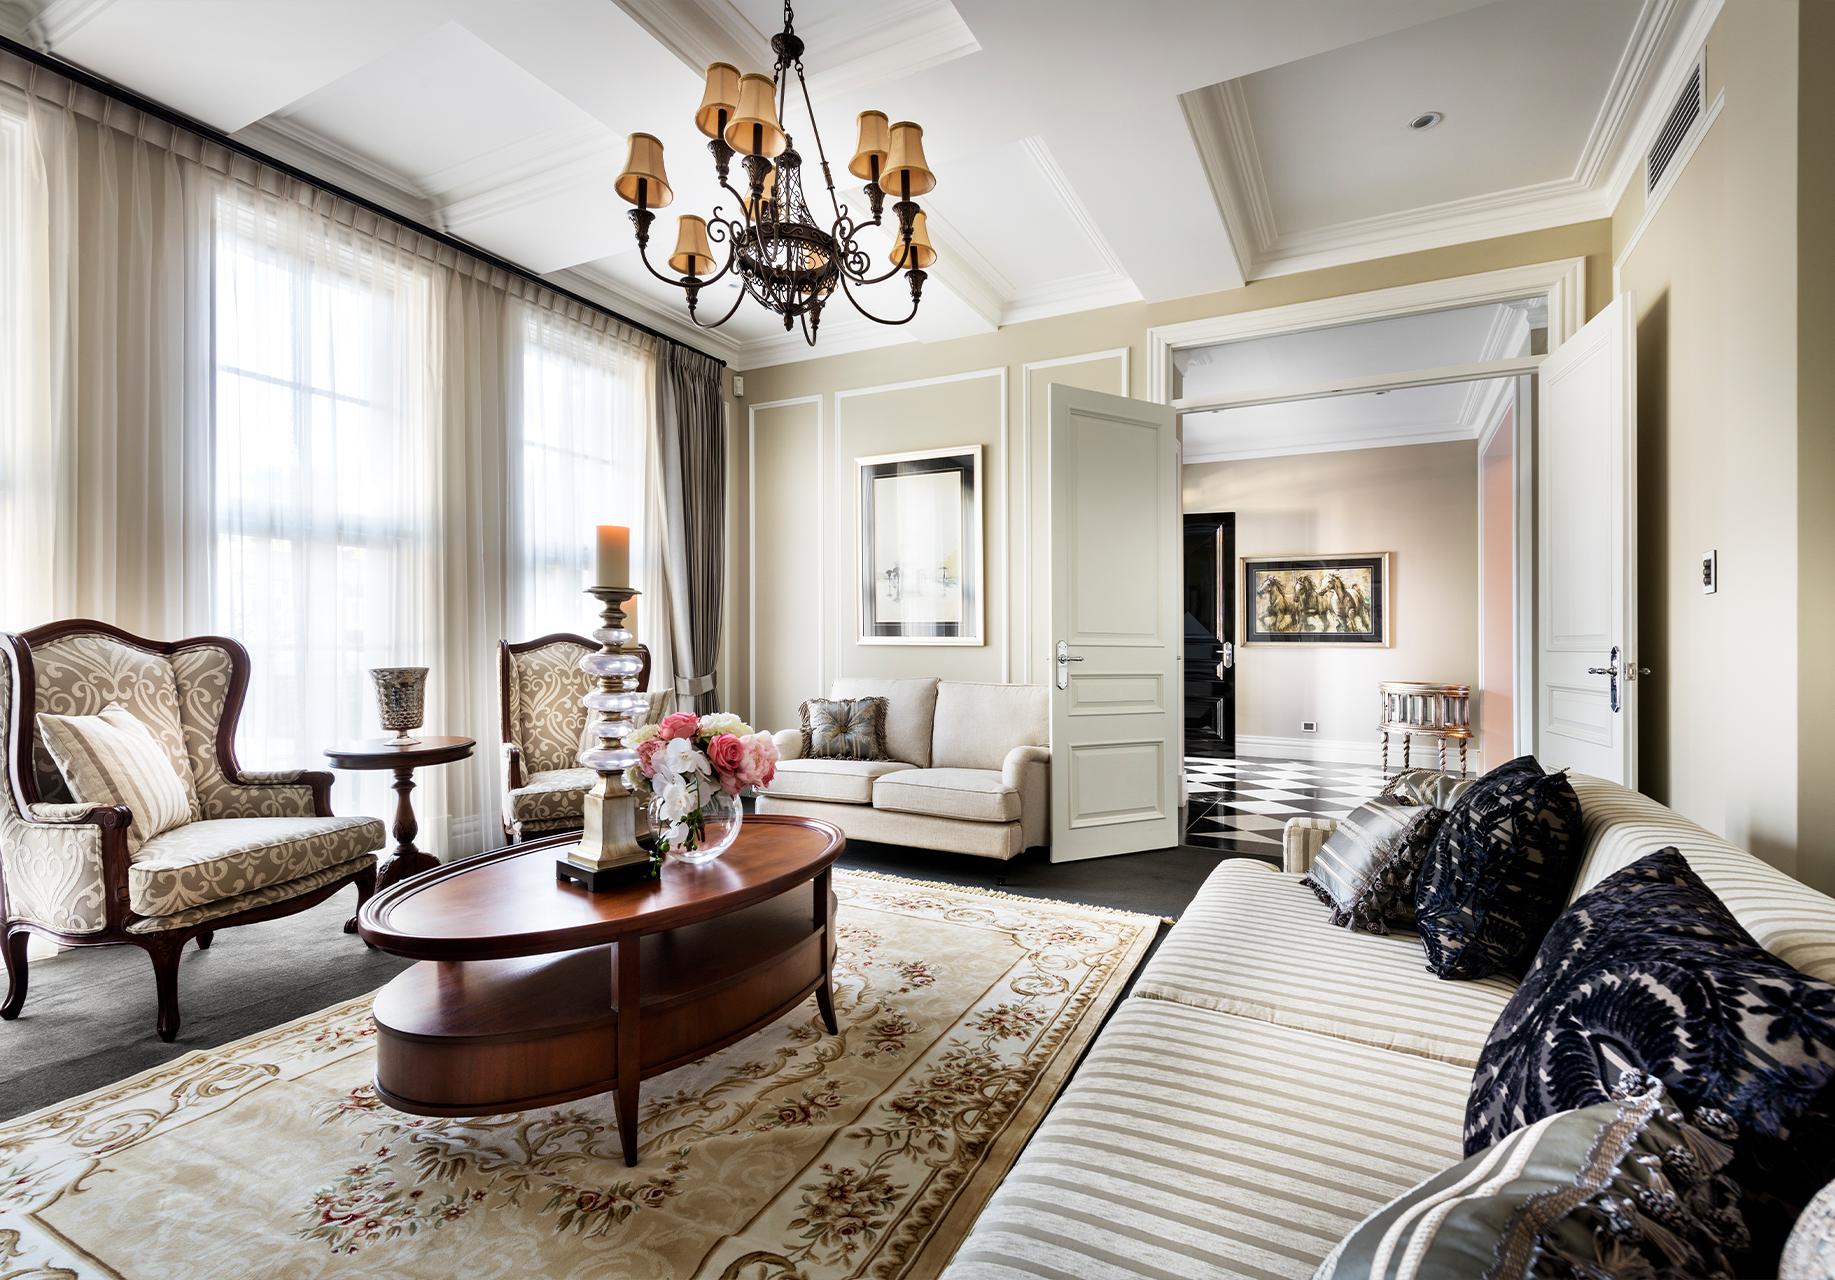 Royal elite living room =-  living room inspiration